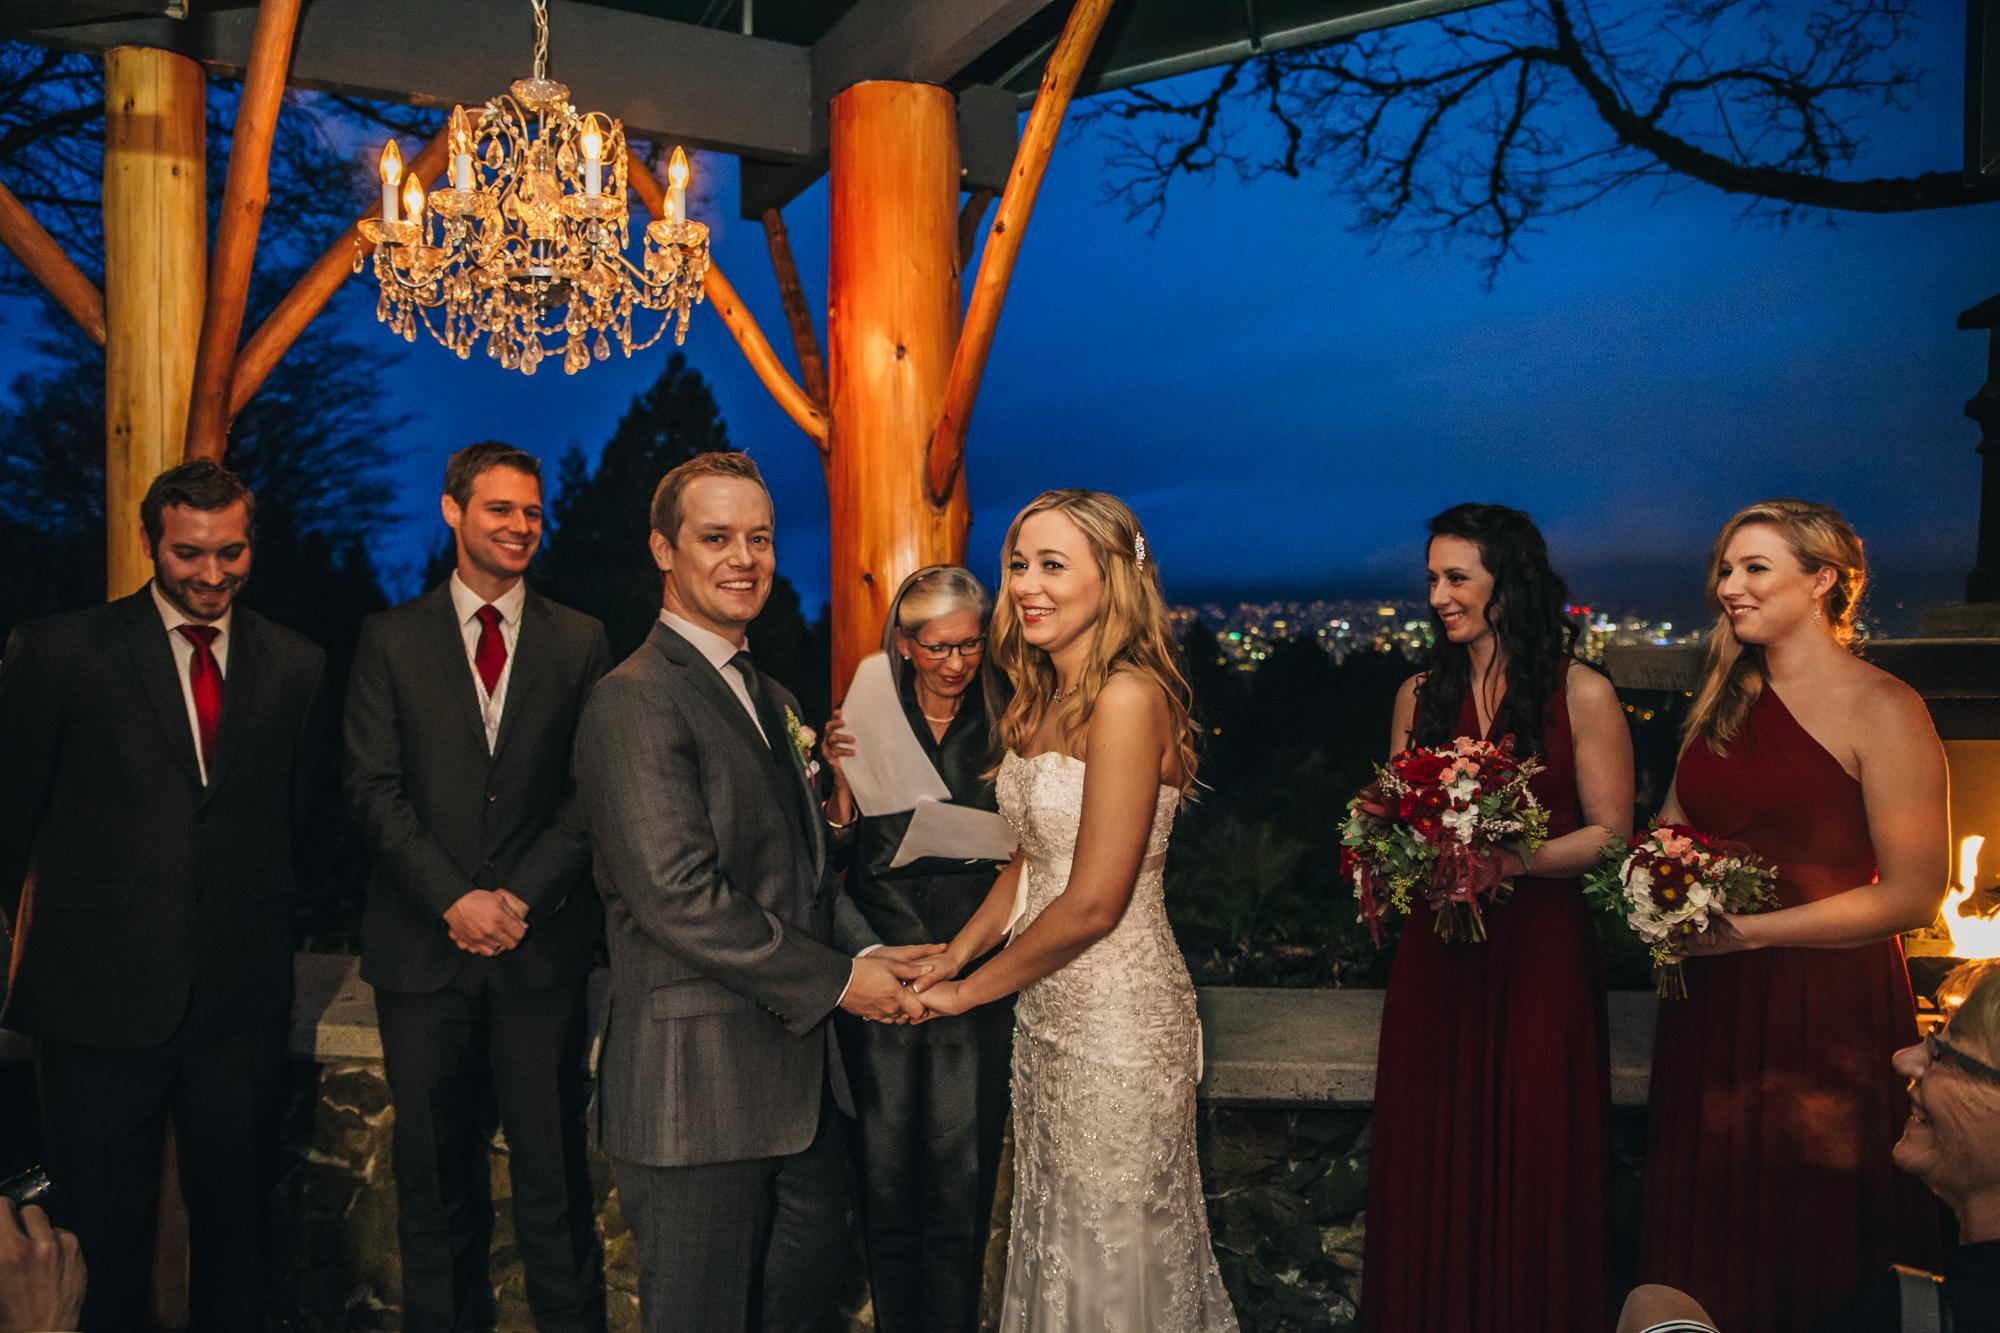 29-seasons-in-the-park-wedding-patio-ceremony.jpg